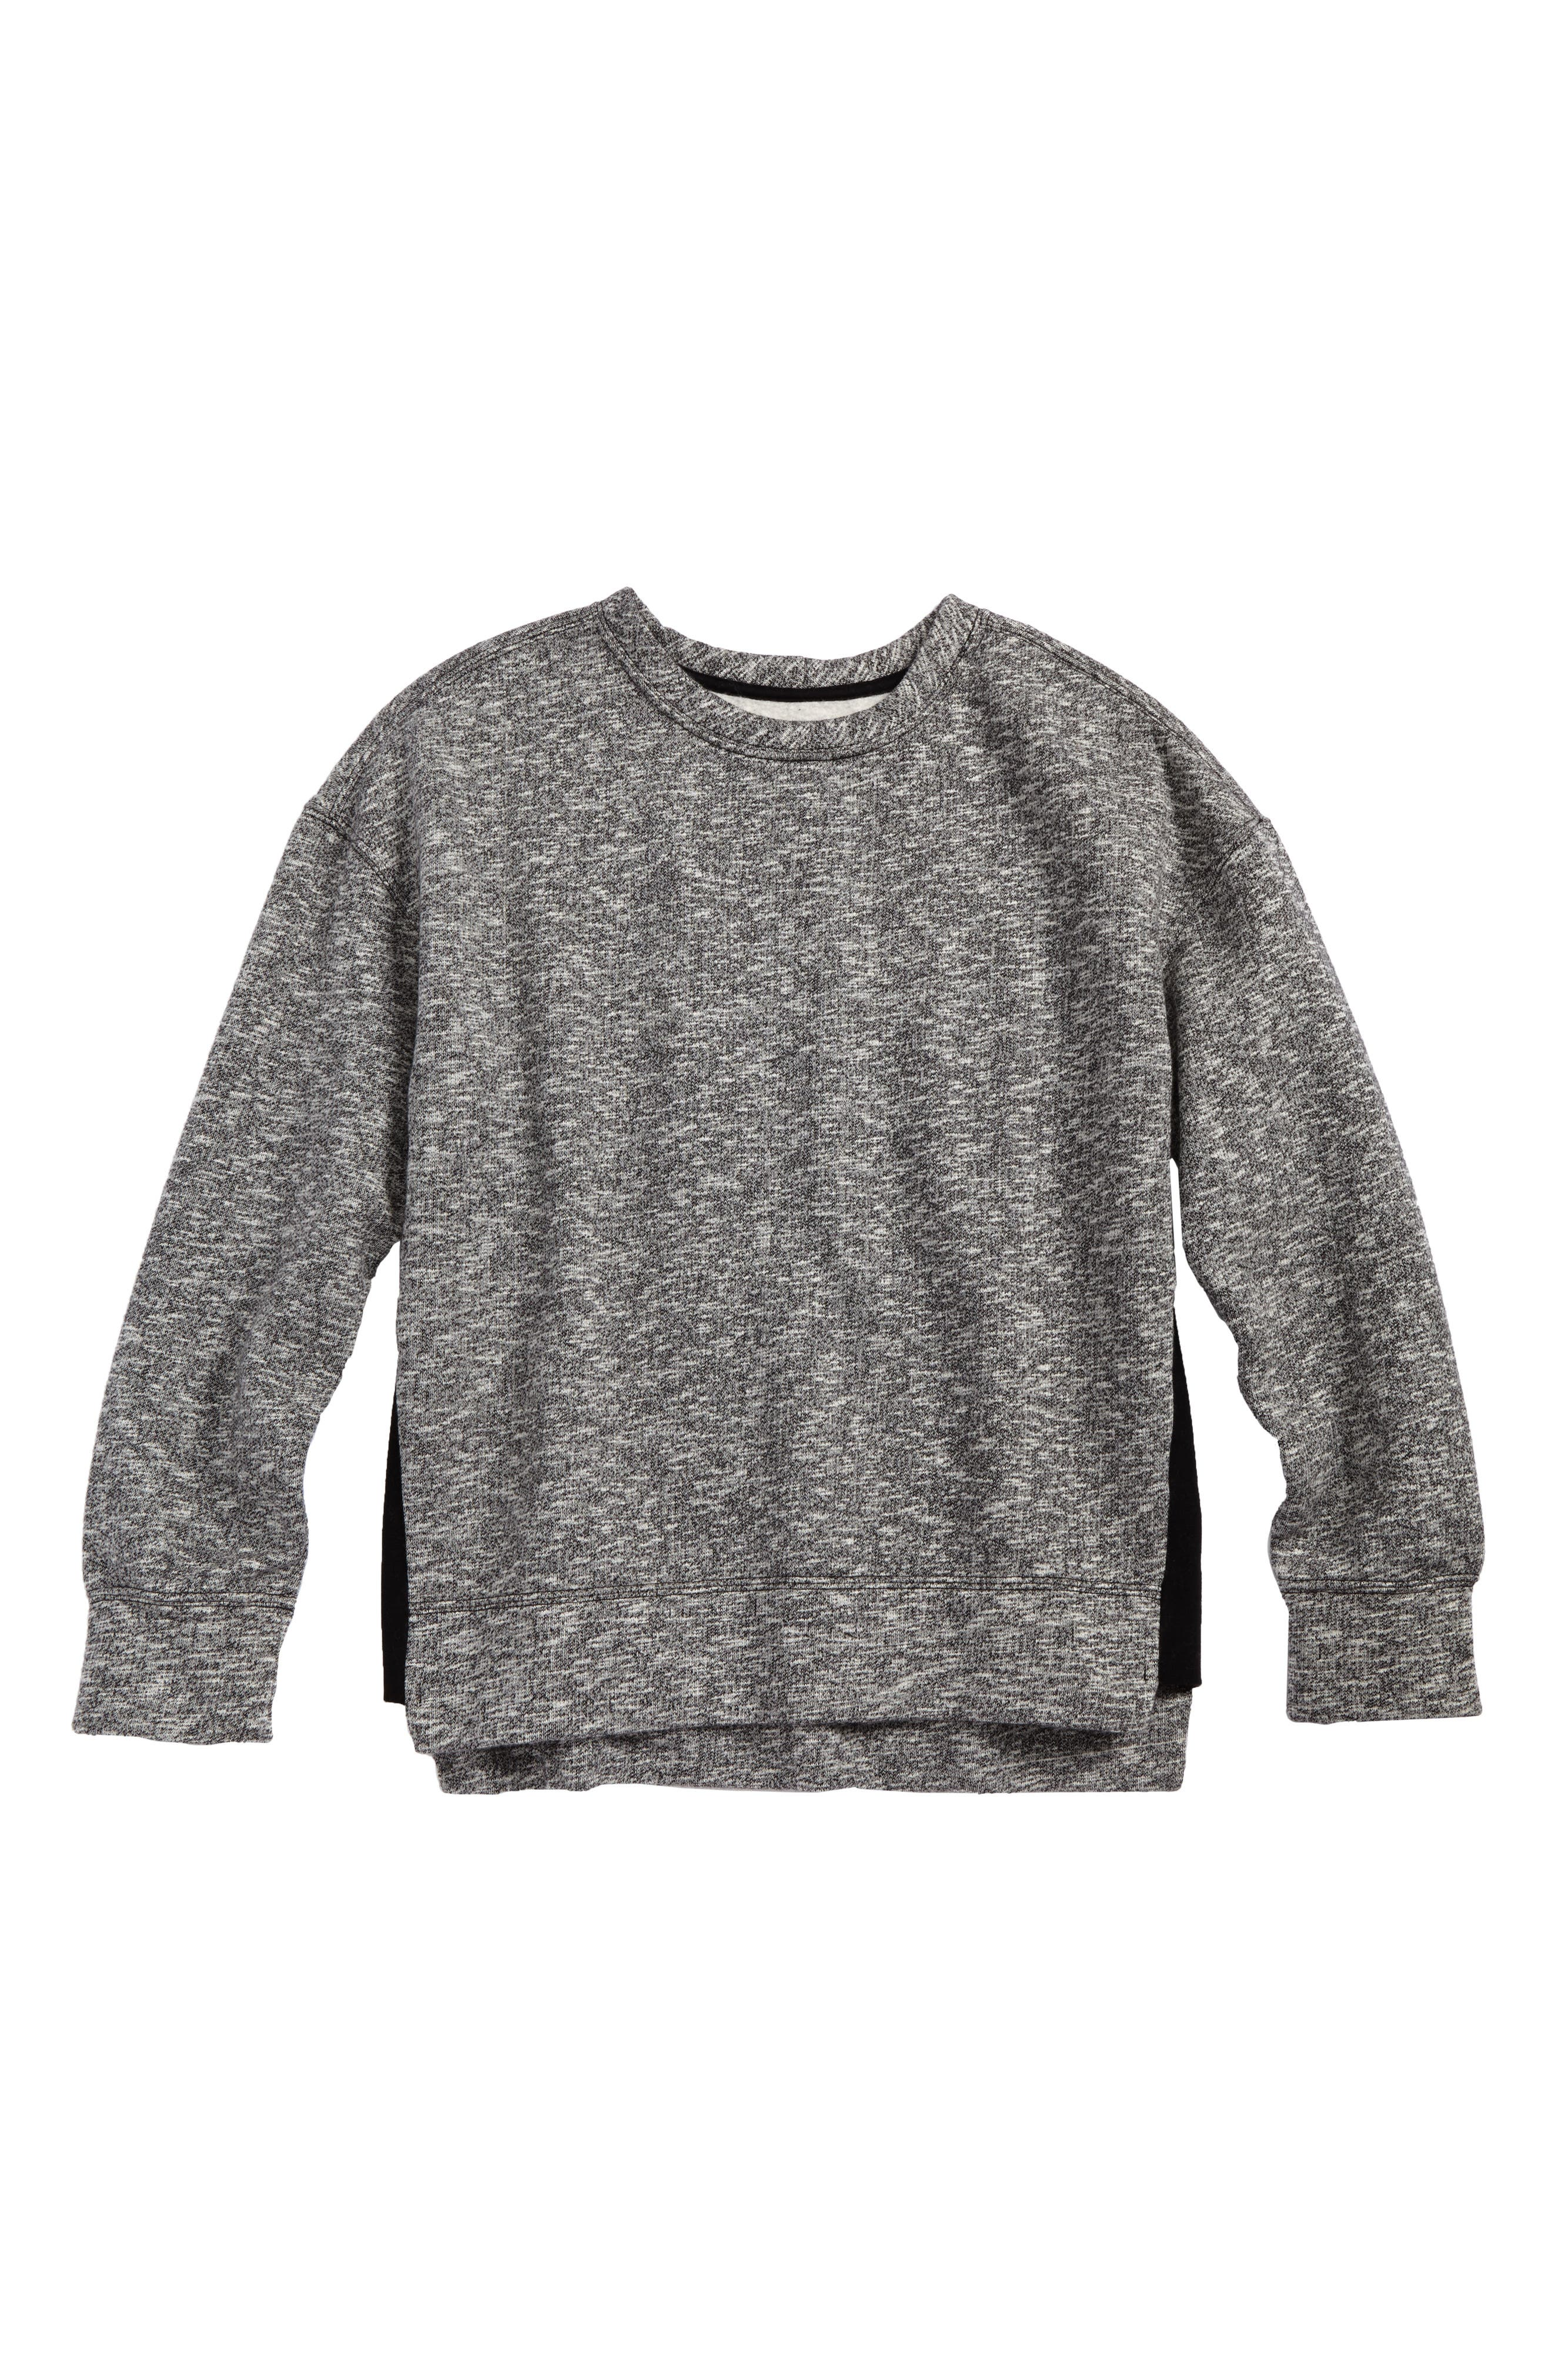 High/Low Sweatshirt,                             Main thumbnail 1, color,                             020